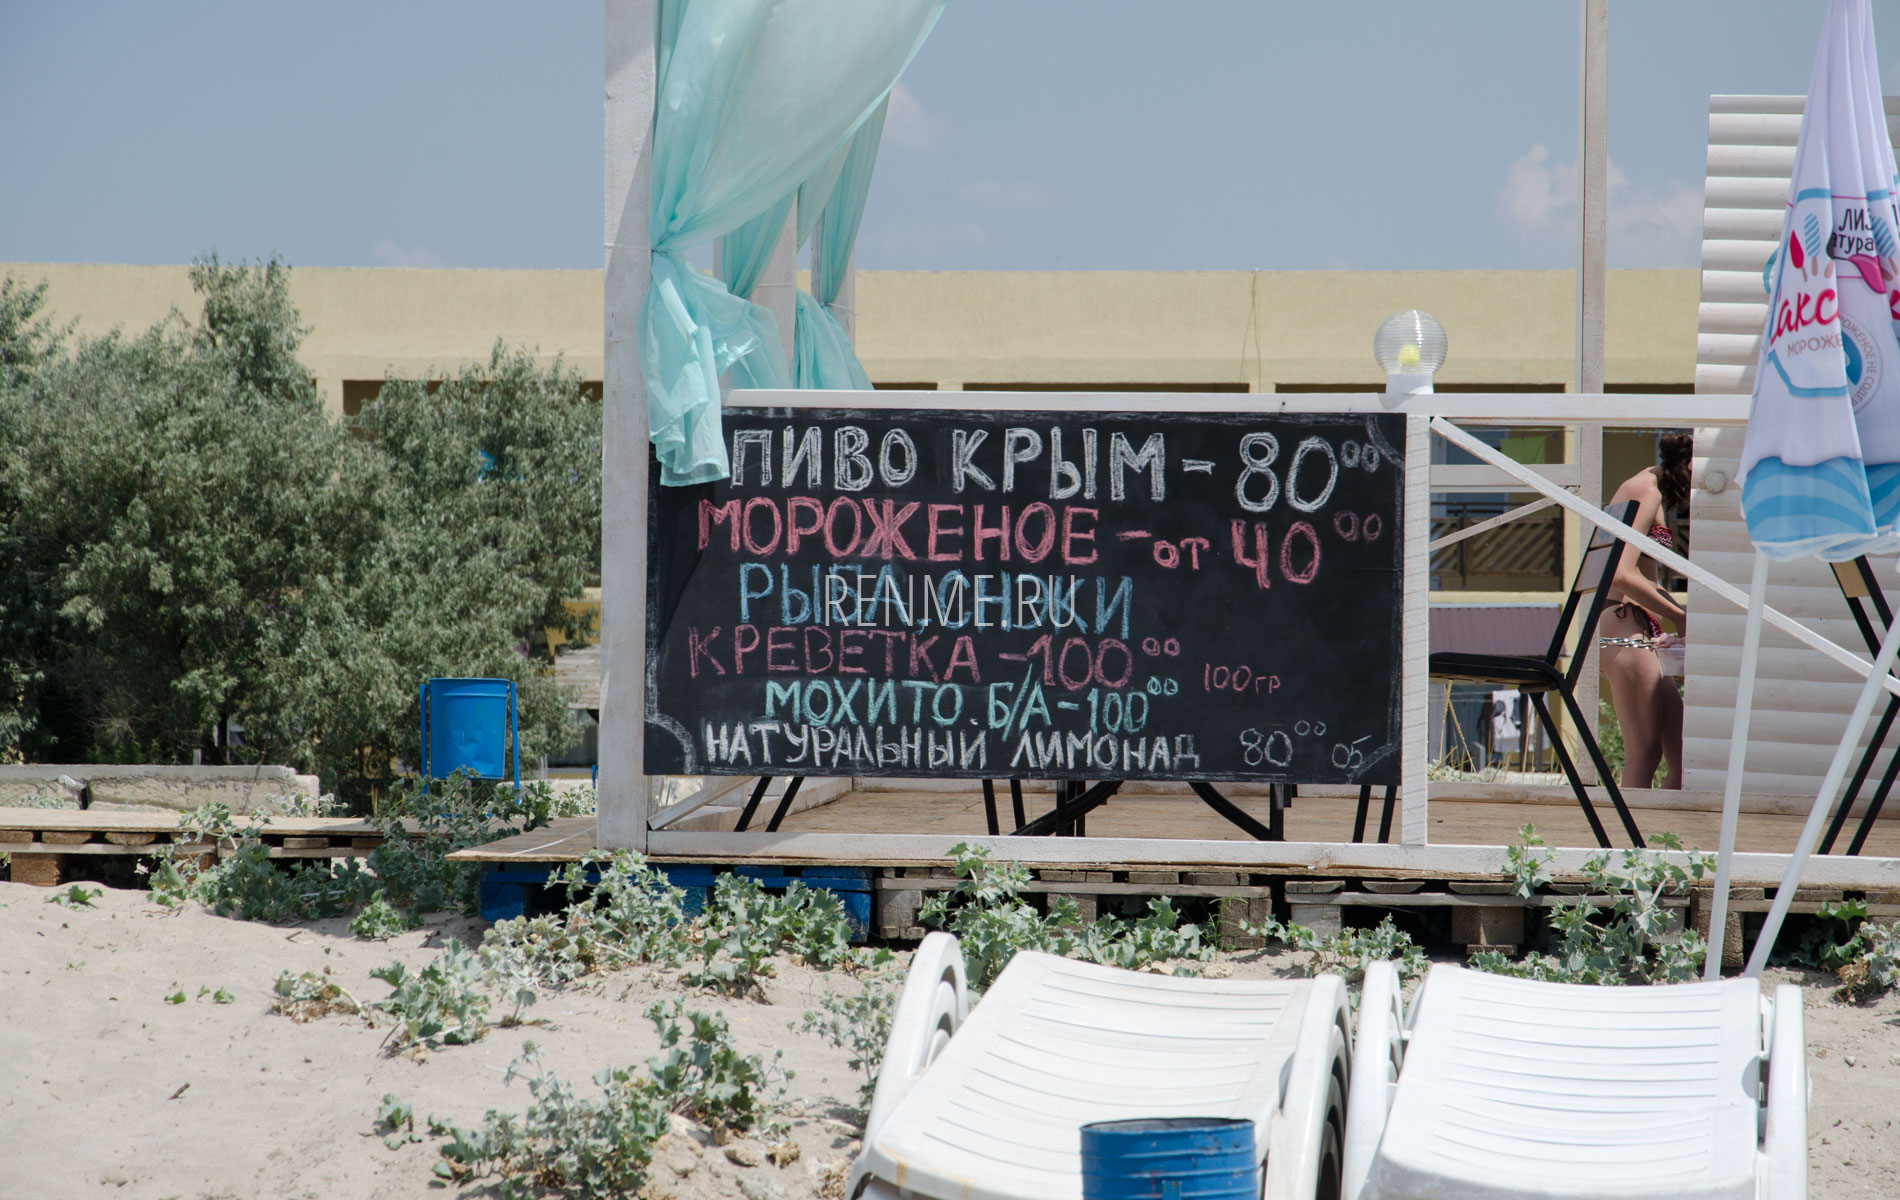 Цены на центральном поселковом пляже Штормового. Фото Штормового